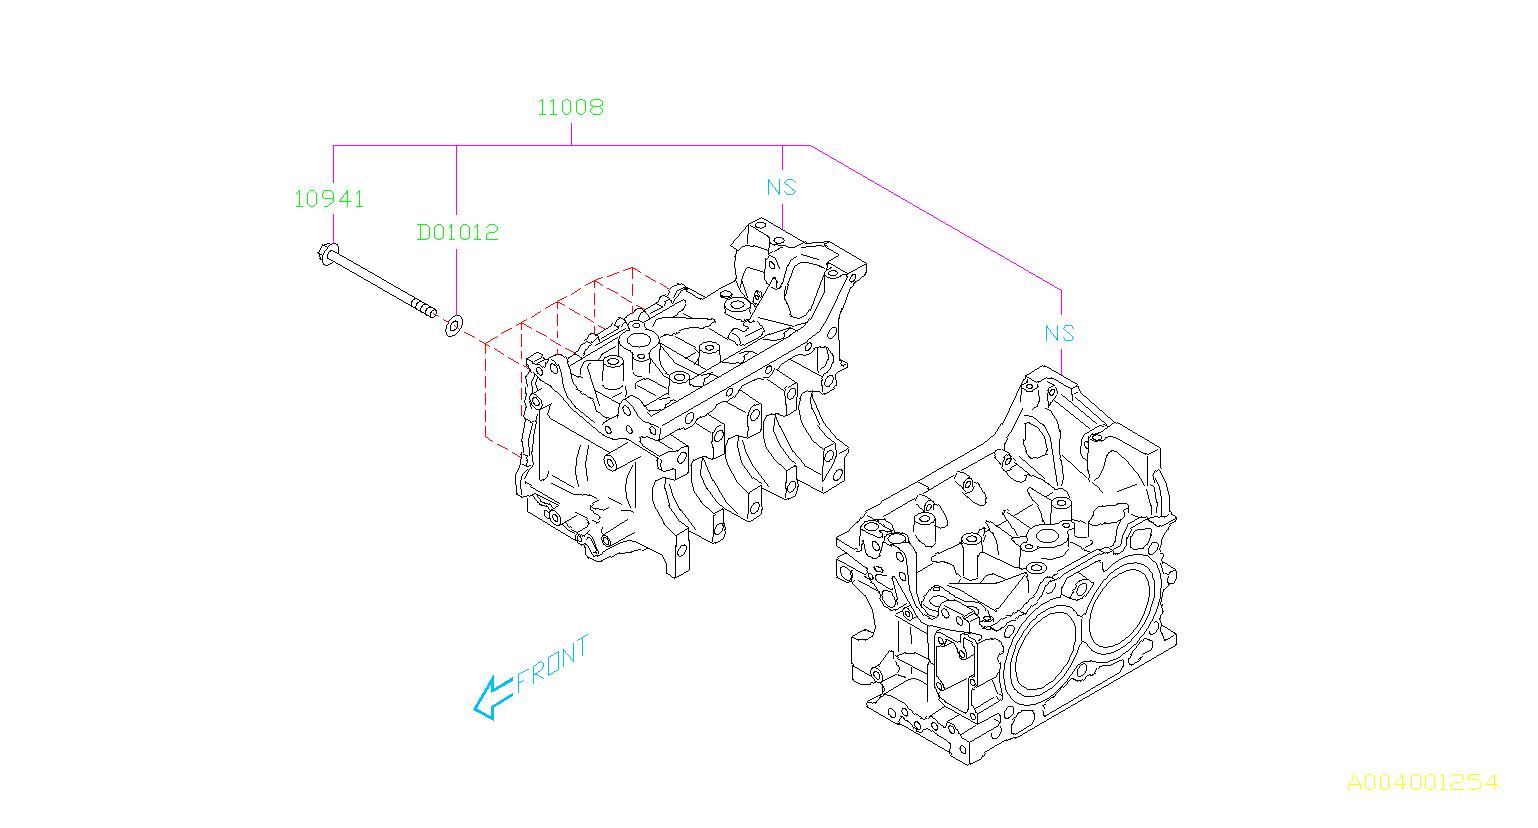 2018 Subaru Forester 2.5L 6MT Base Premium Block set